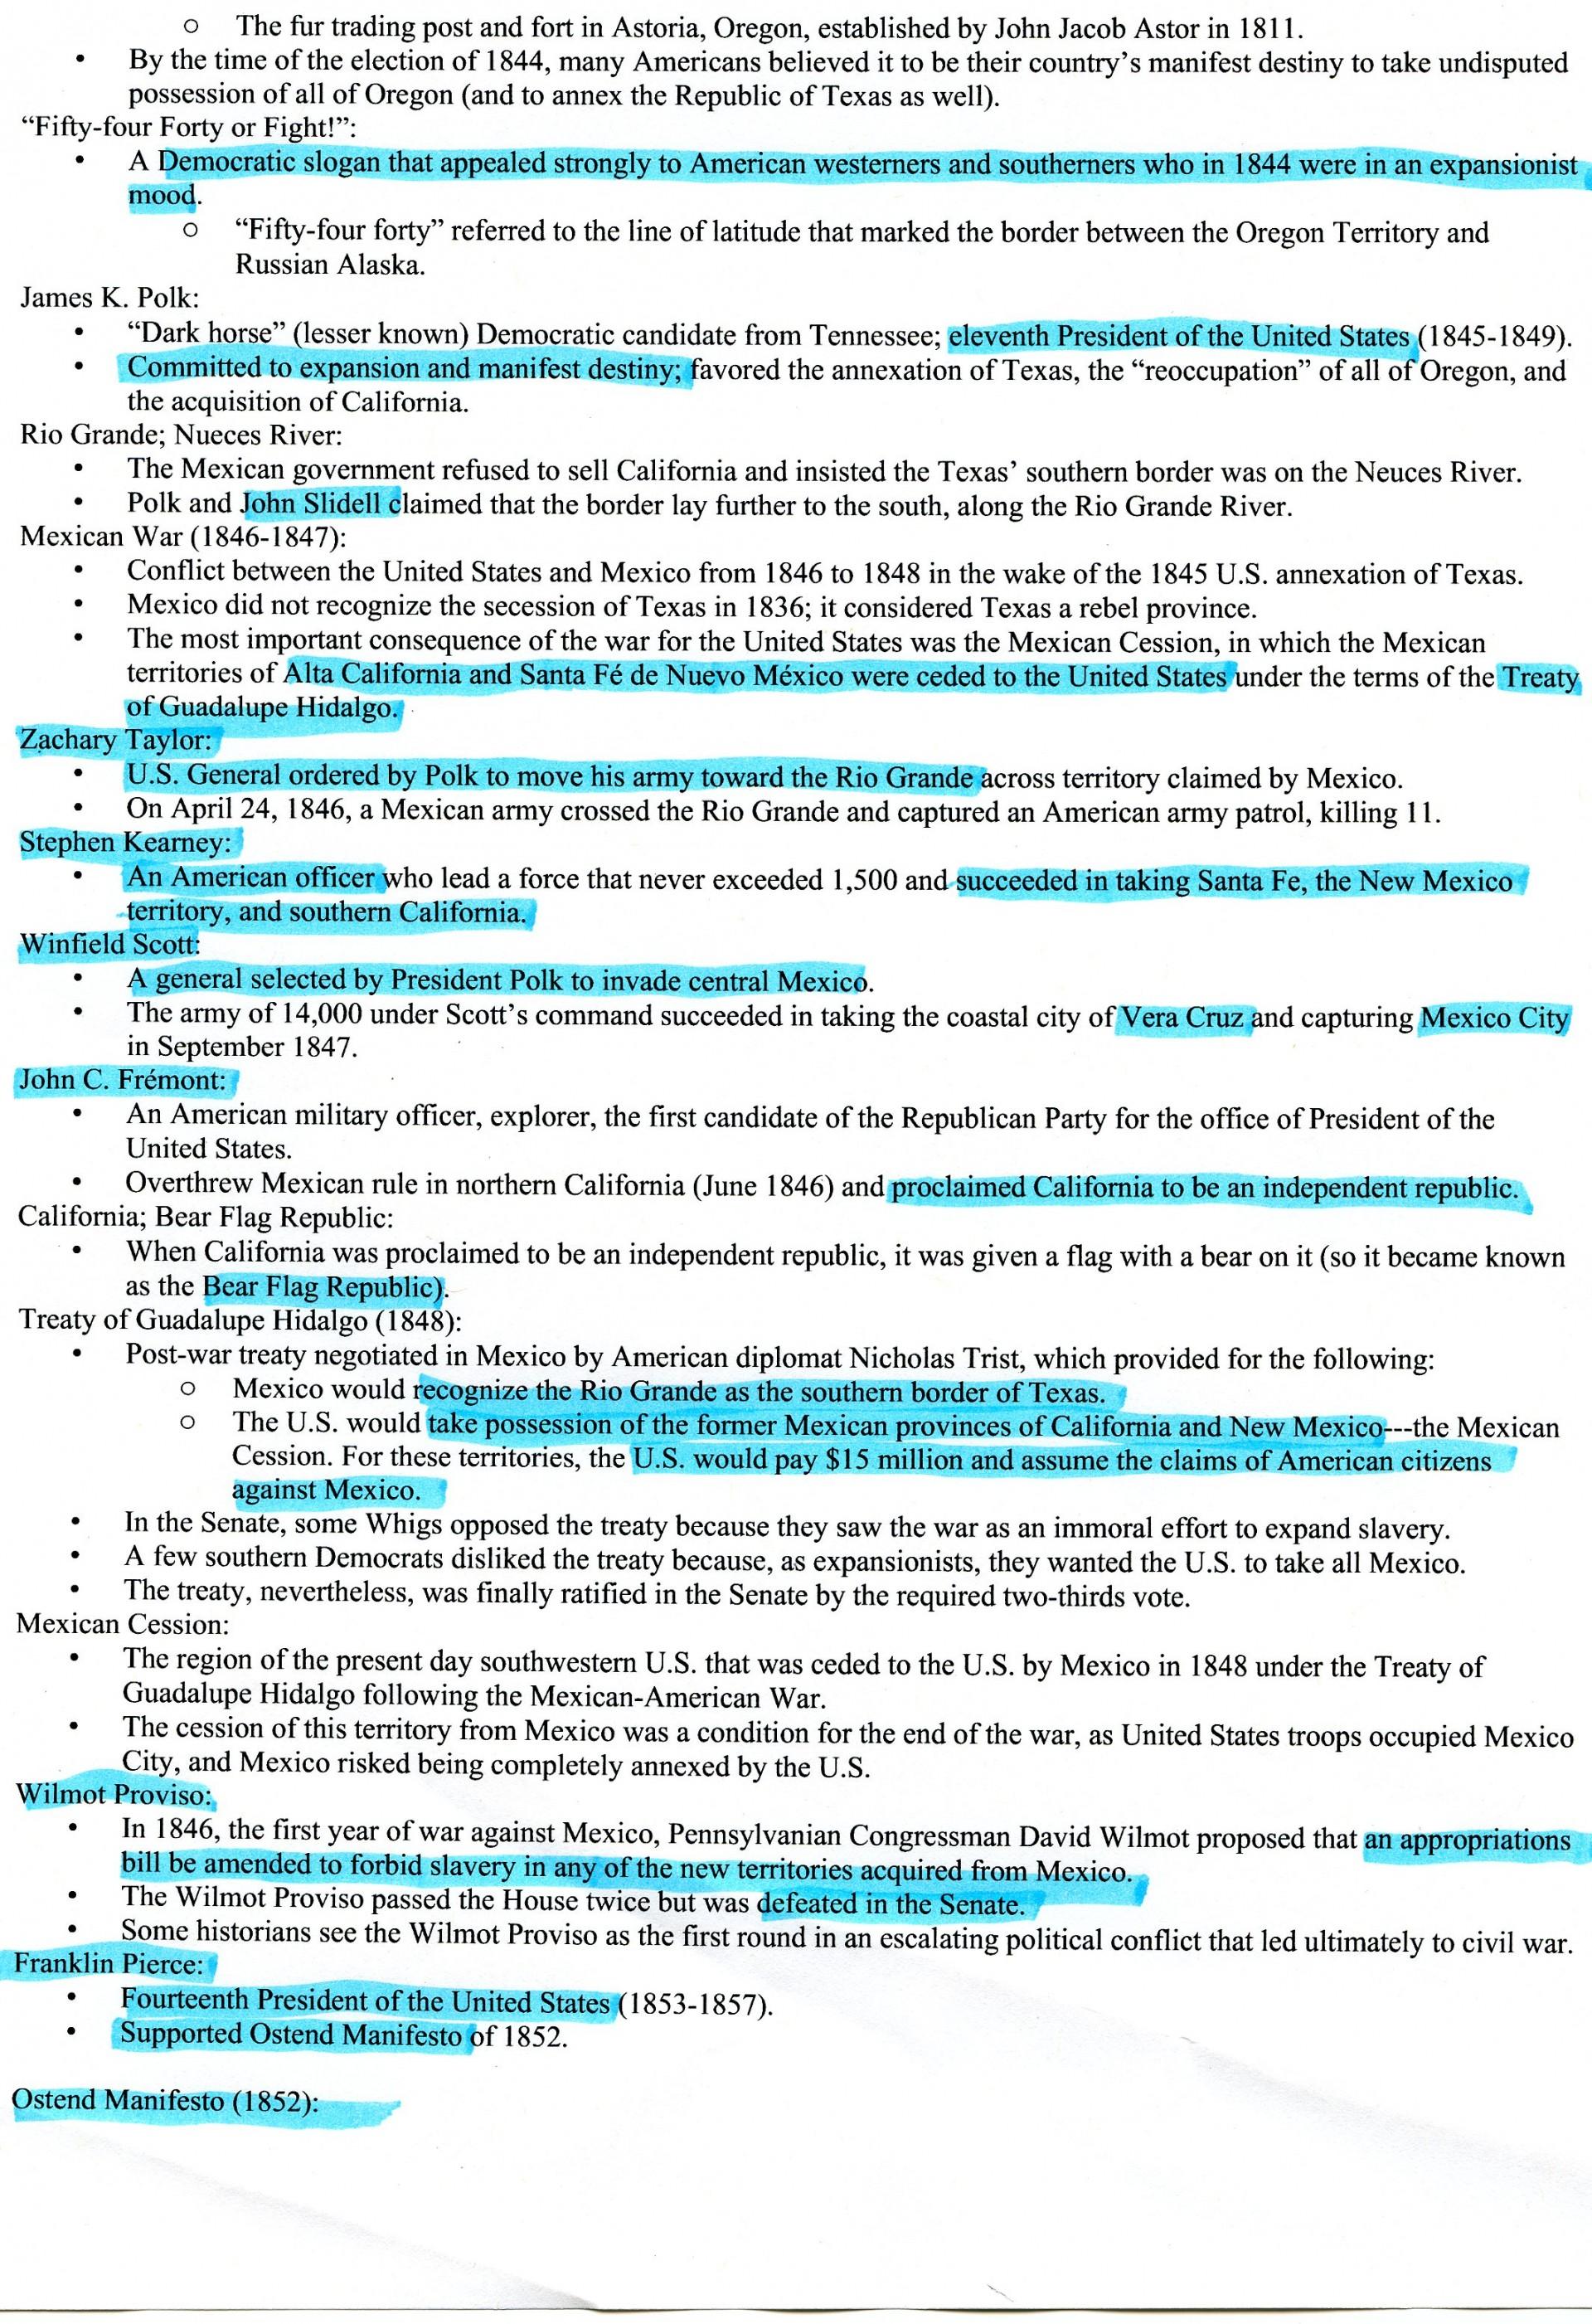 008 Essay Example Manifest Destiny Apush Essays Free Titles On Questions About Megaessays Com Prompt Conclusion Hook Outline Pro Over Impressive Introduction 1920